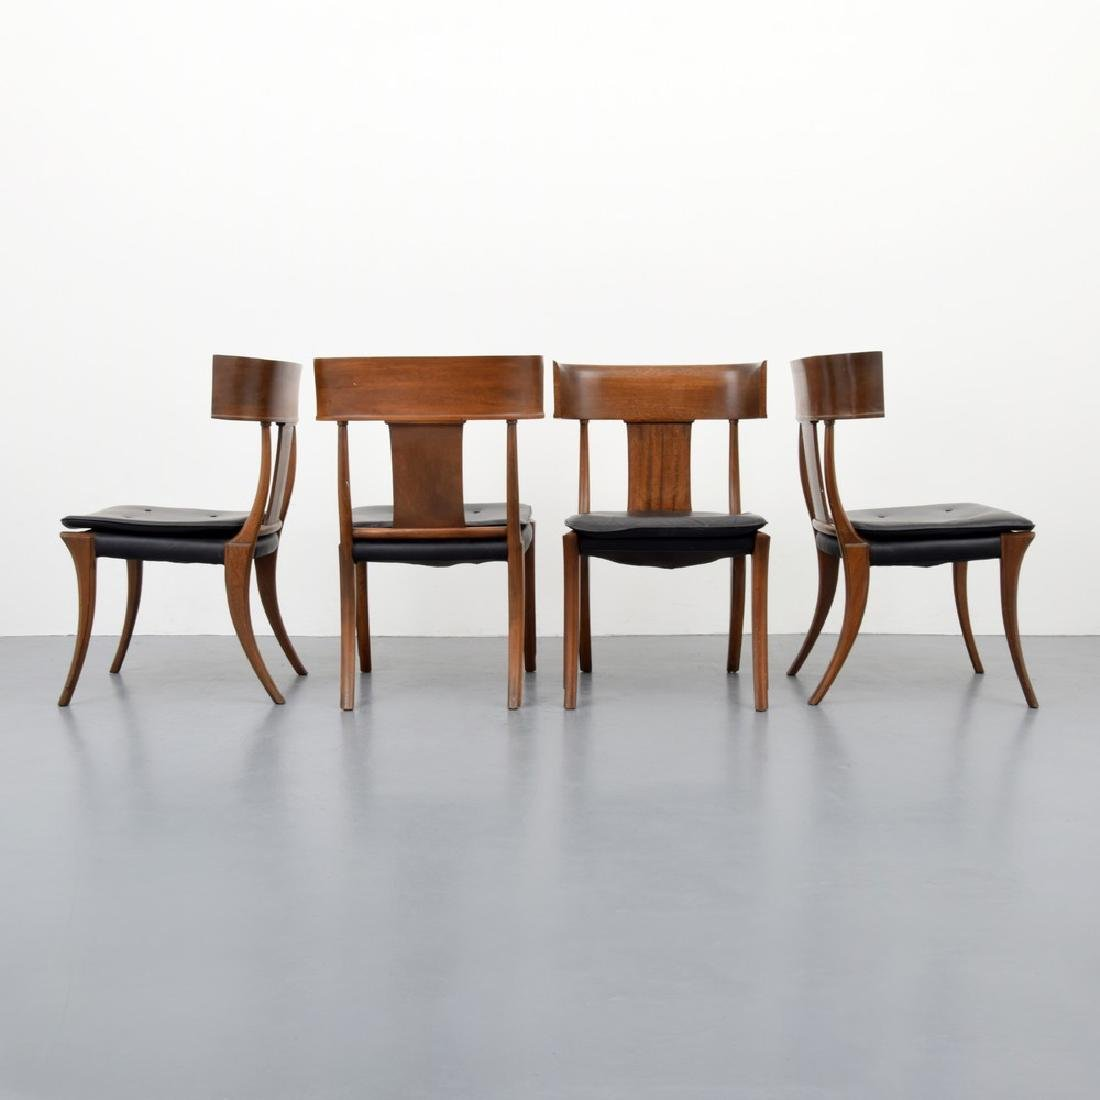 "Stewart & MacDougall ""Klismos"" Dining Chairs, Set of 8 - 11"